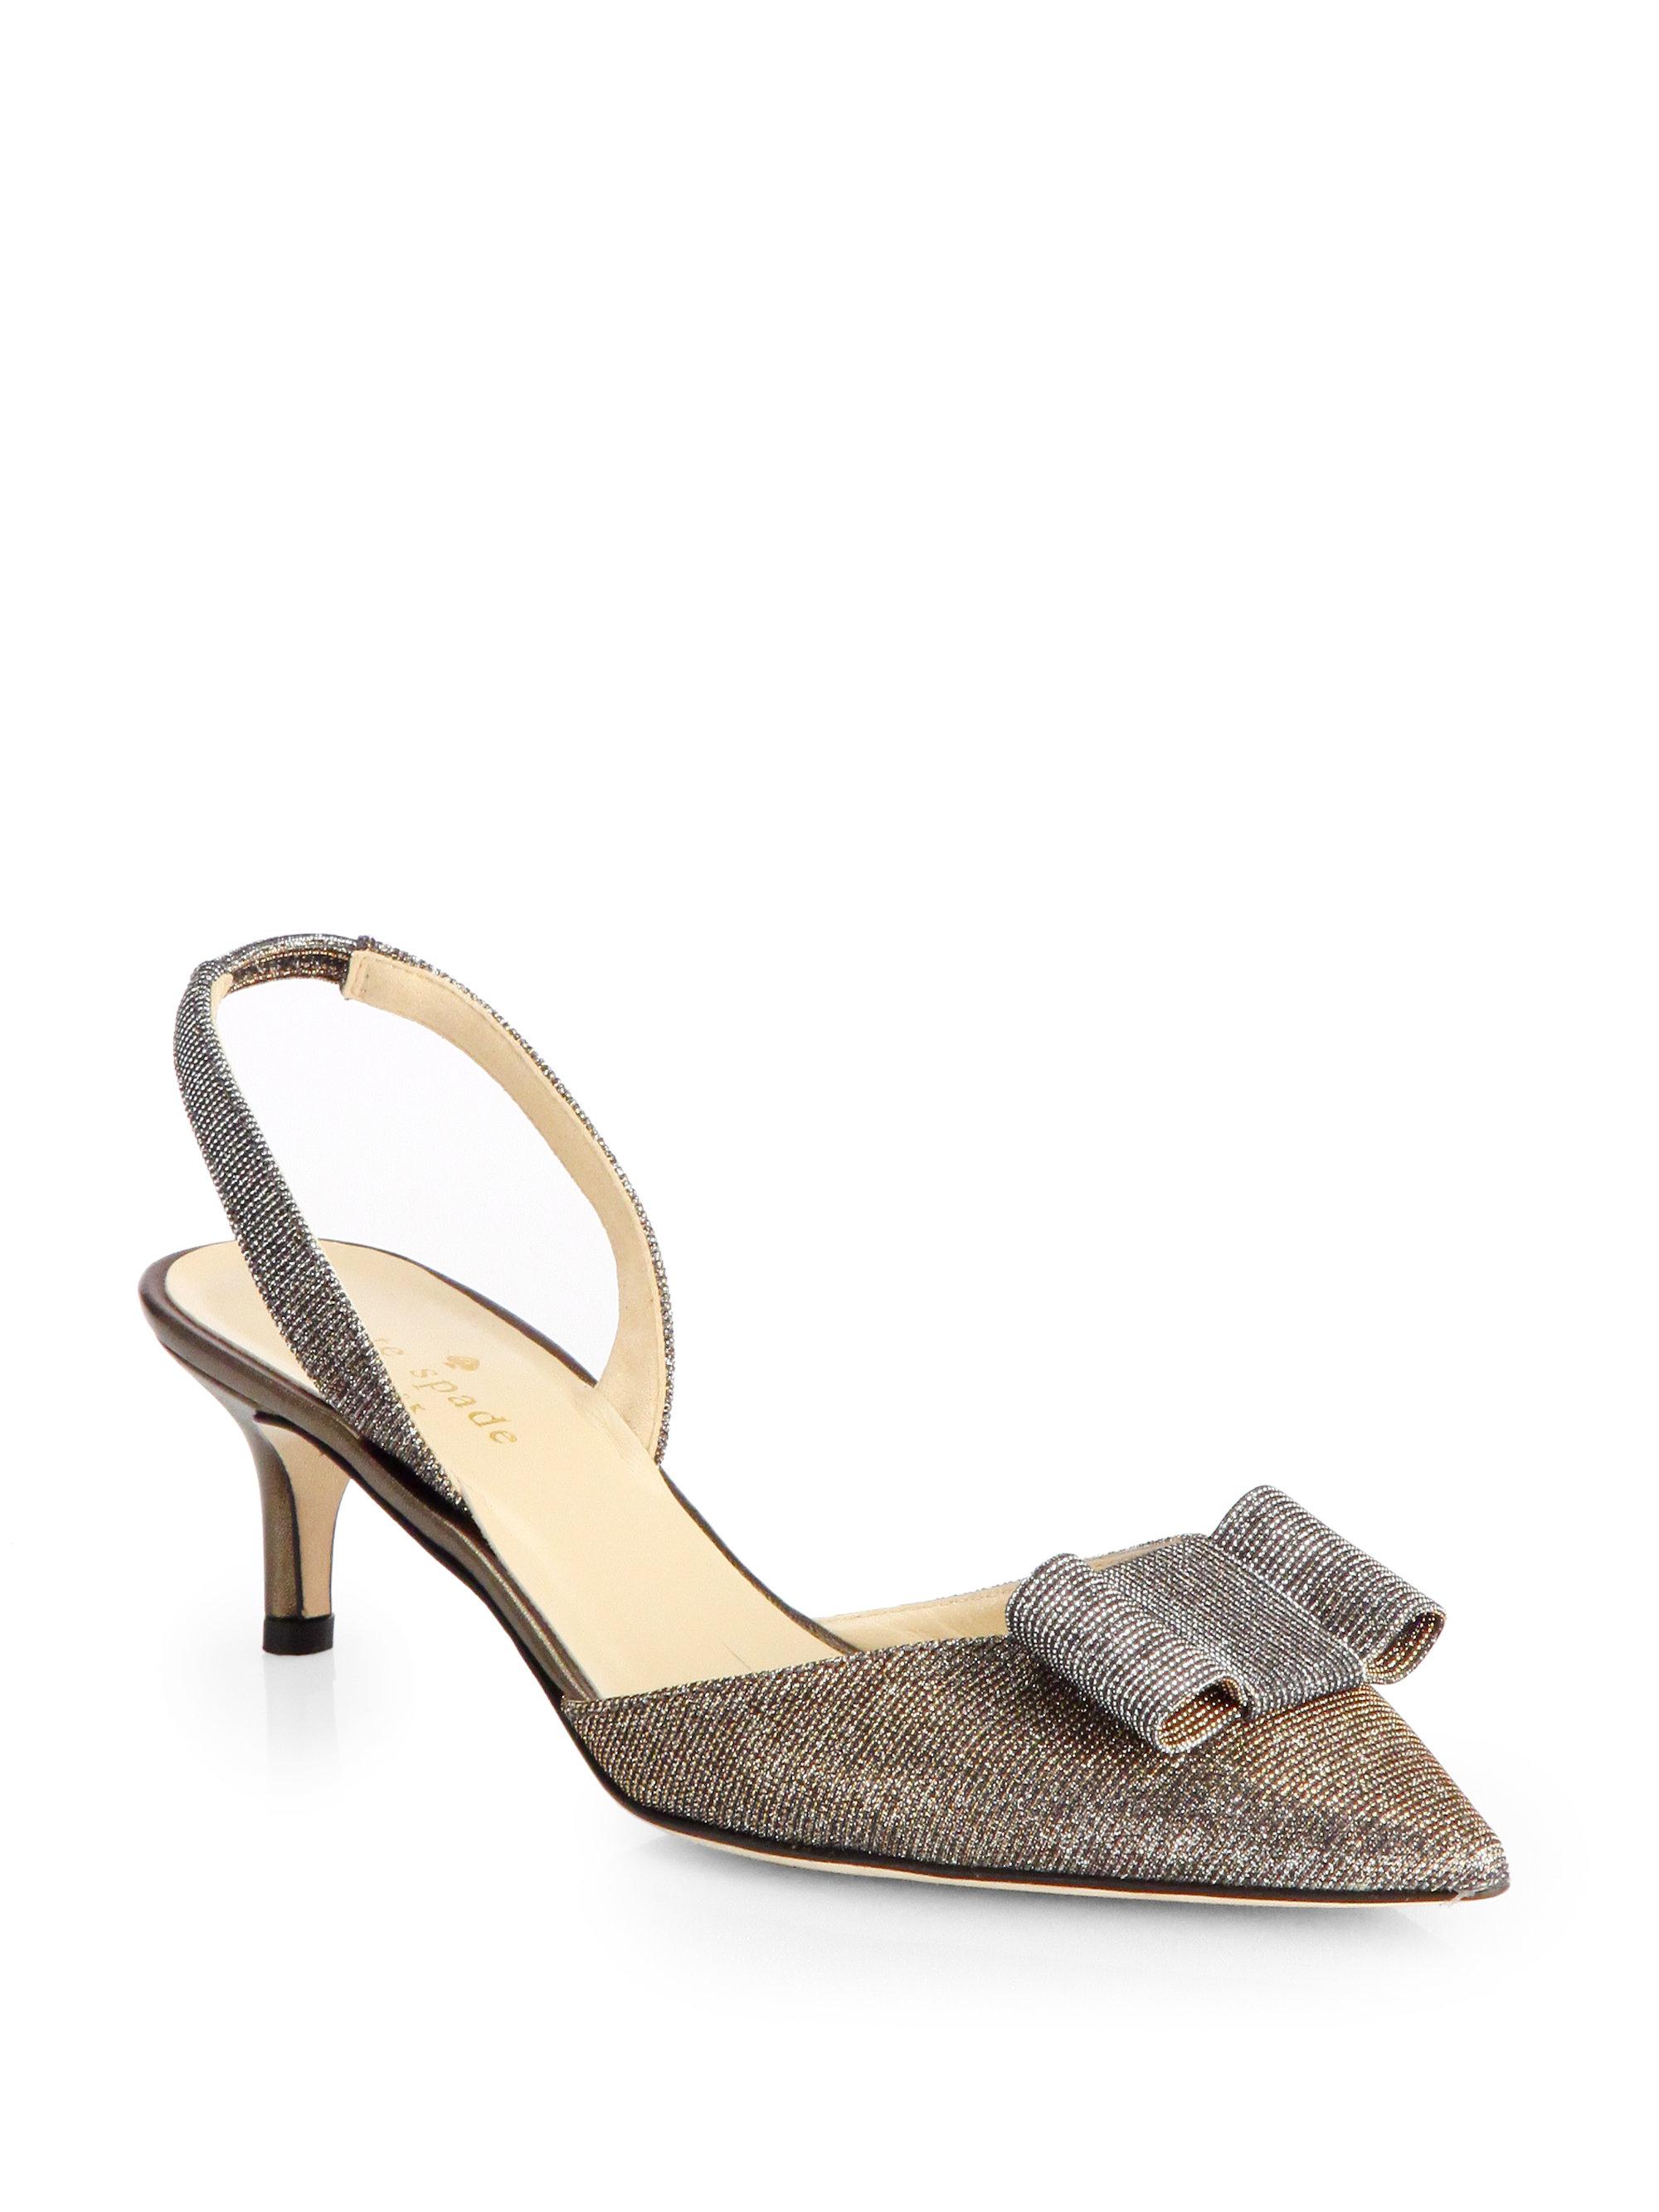 088a1d59d7b0 Lyst - Kate Spade Susi Metallic Lowheel Slingback Pumps in Brown